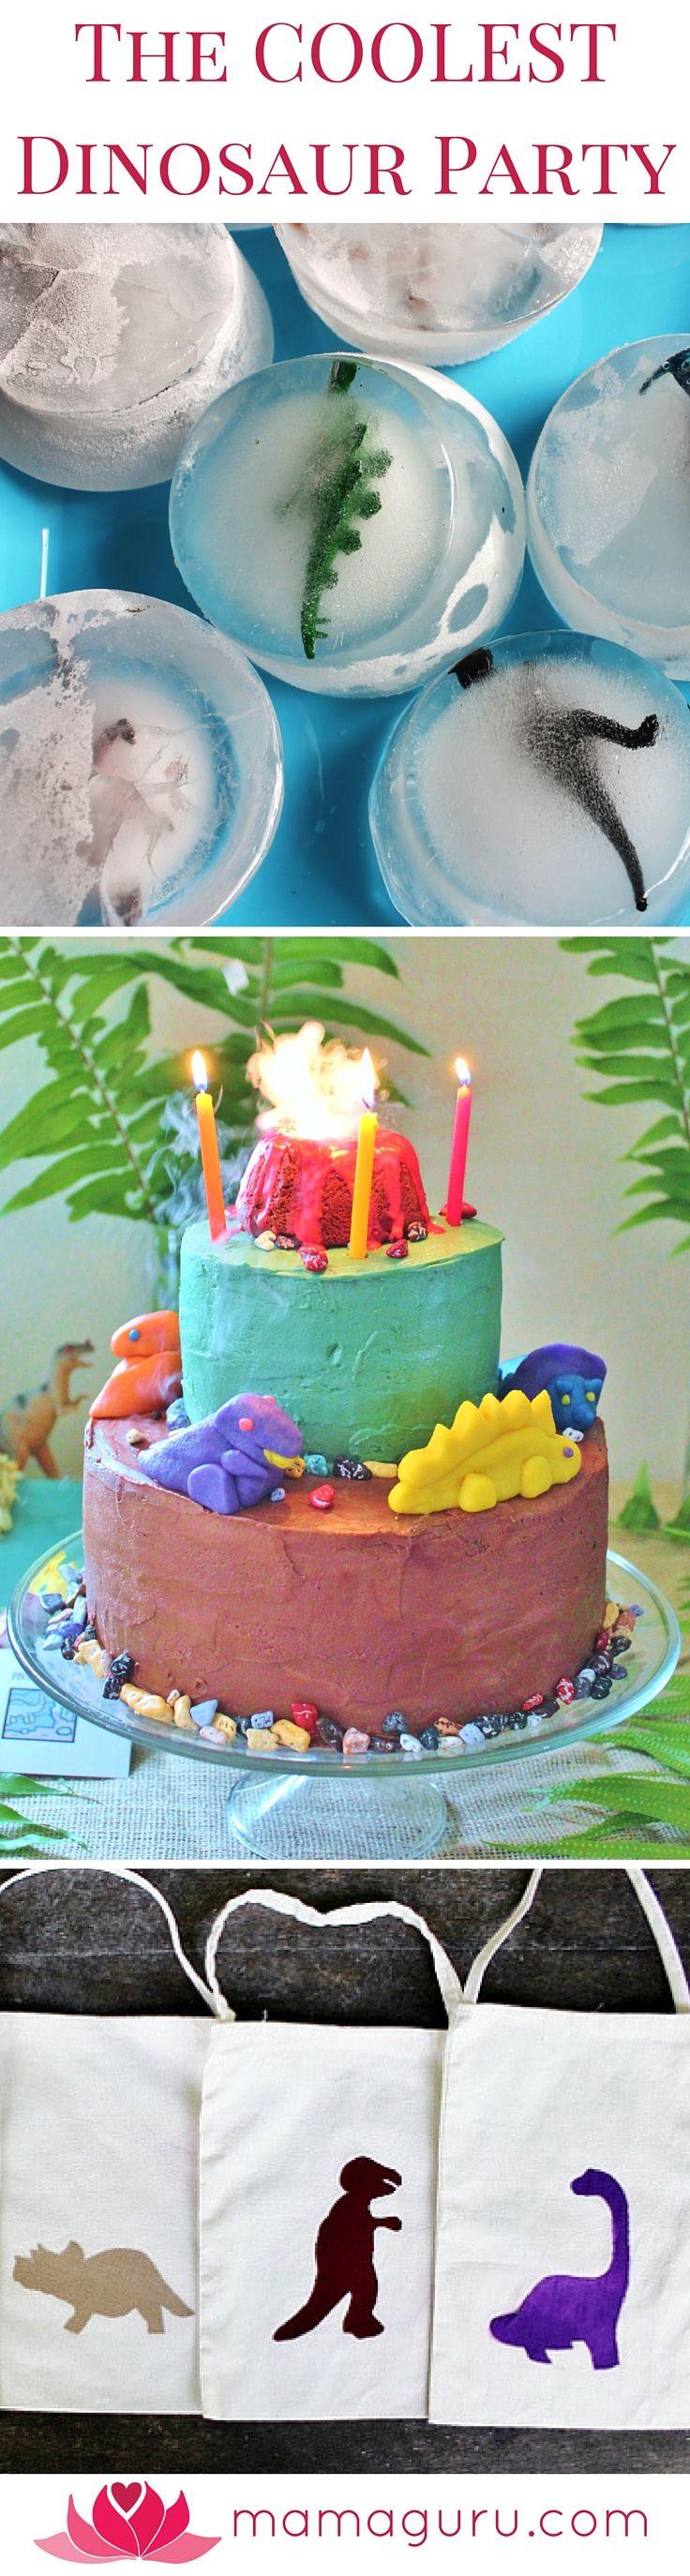 293 best Gordo images on Pinterest   Dinosaur birthday party ...